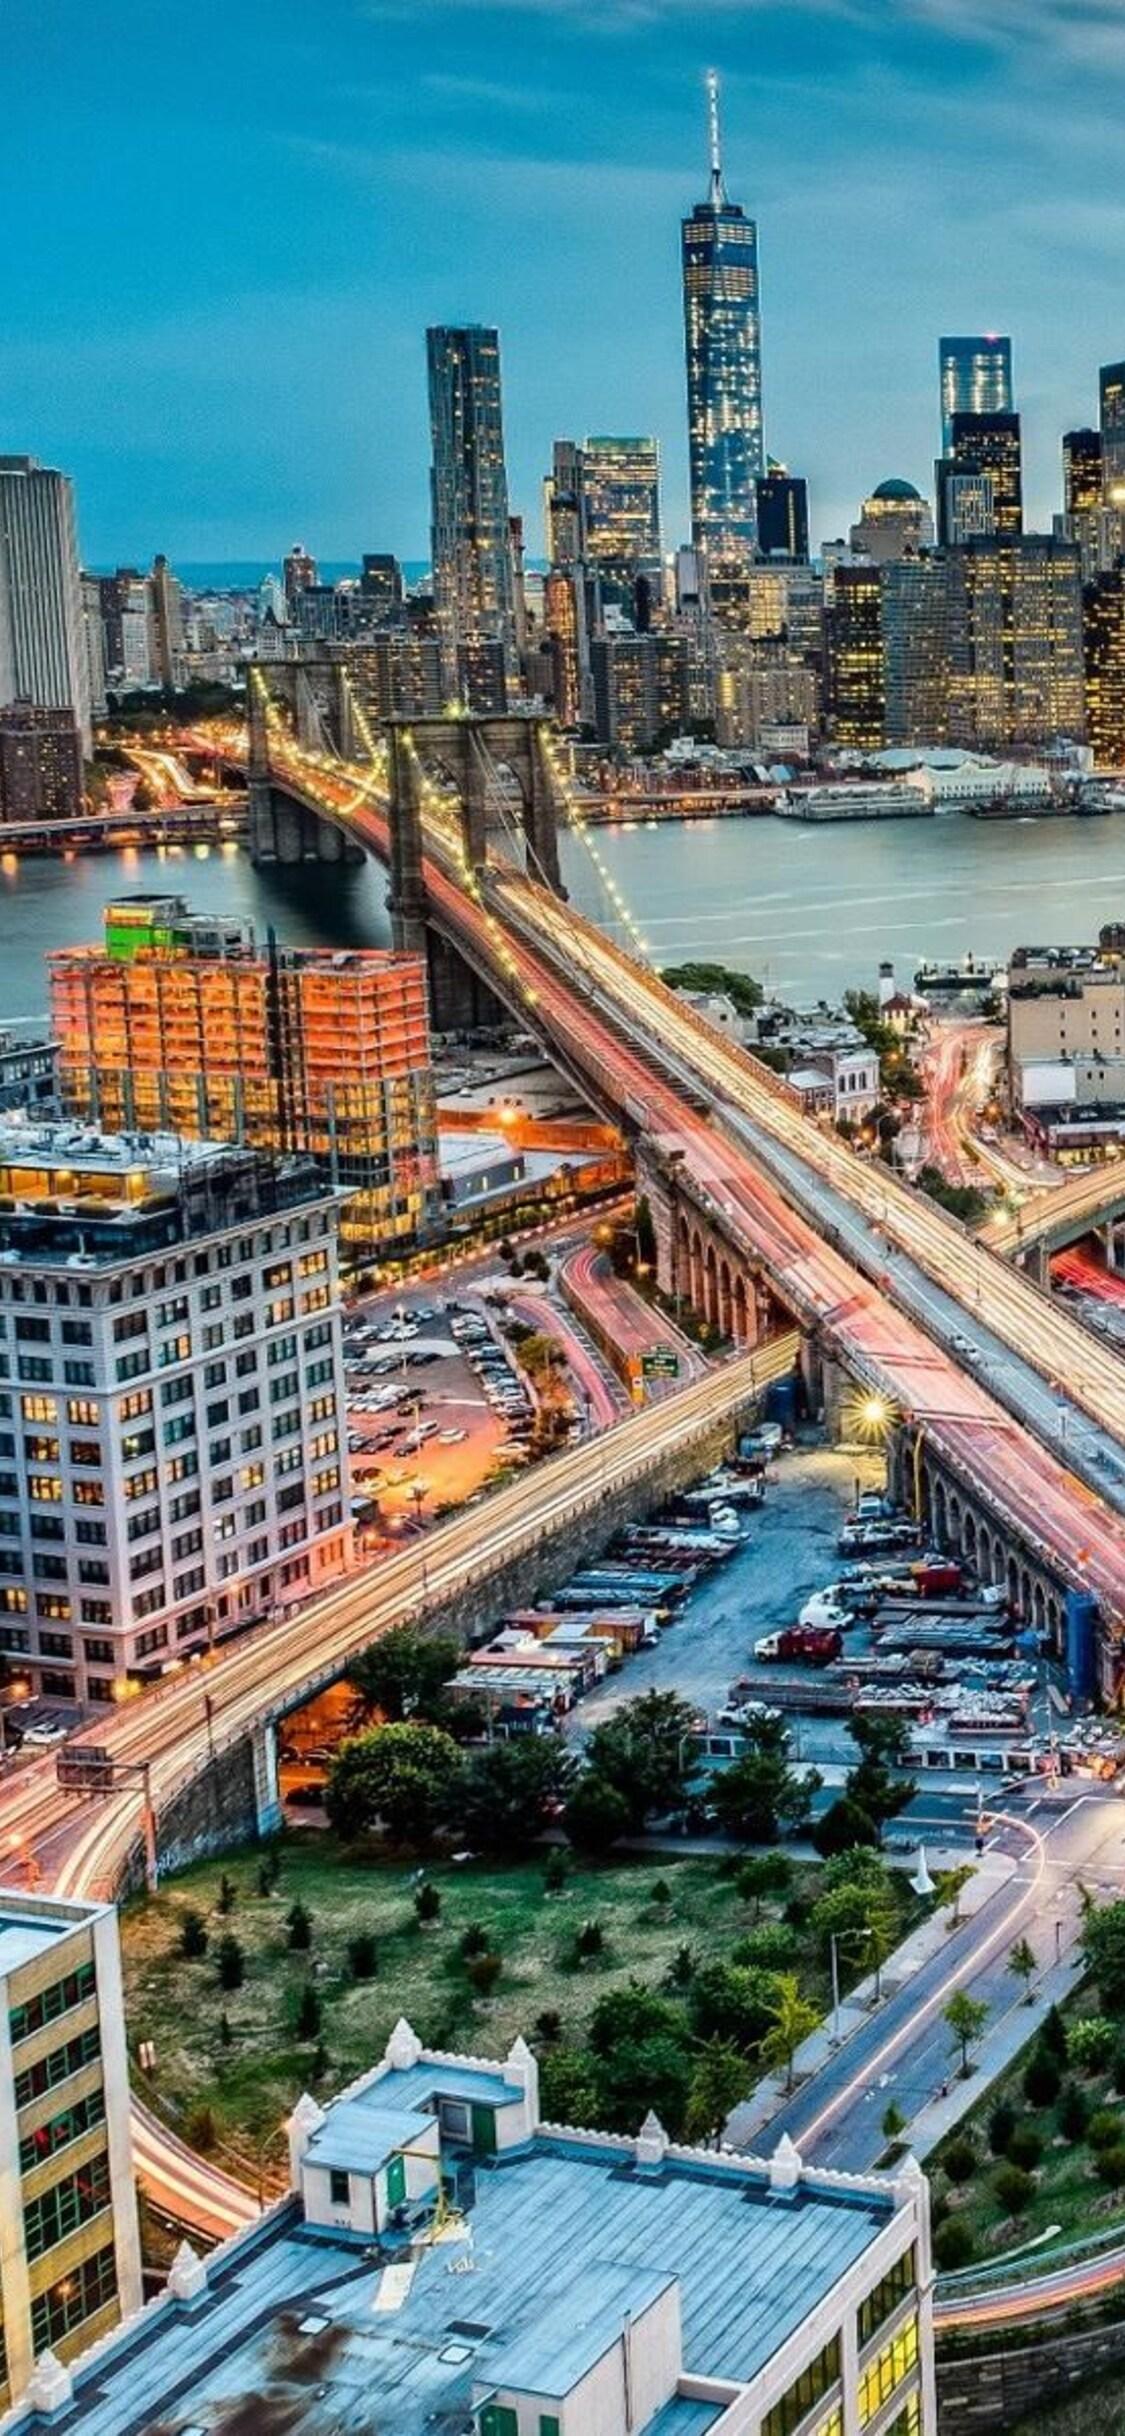 New York Skyline Iphone X Wallpaper Vinny Oleo Vegetal Info